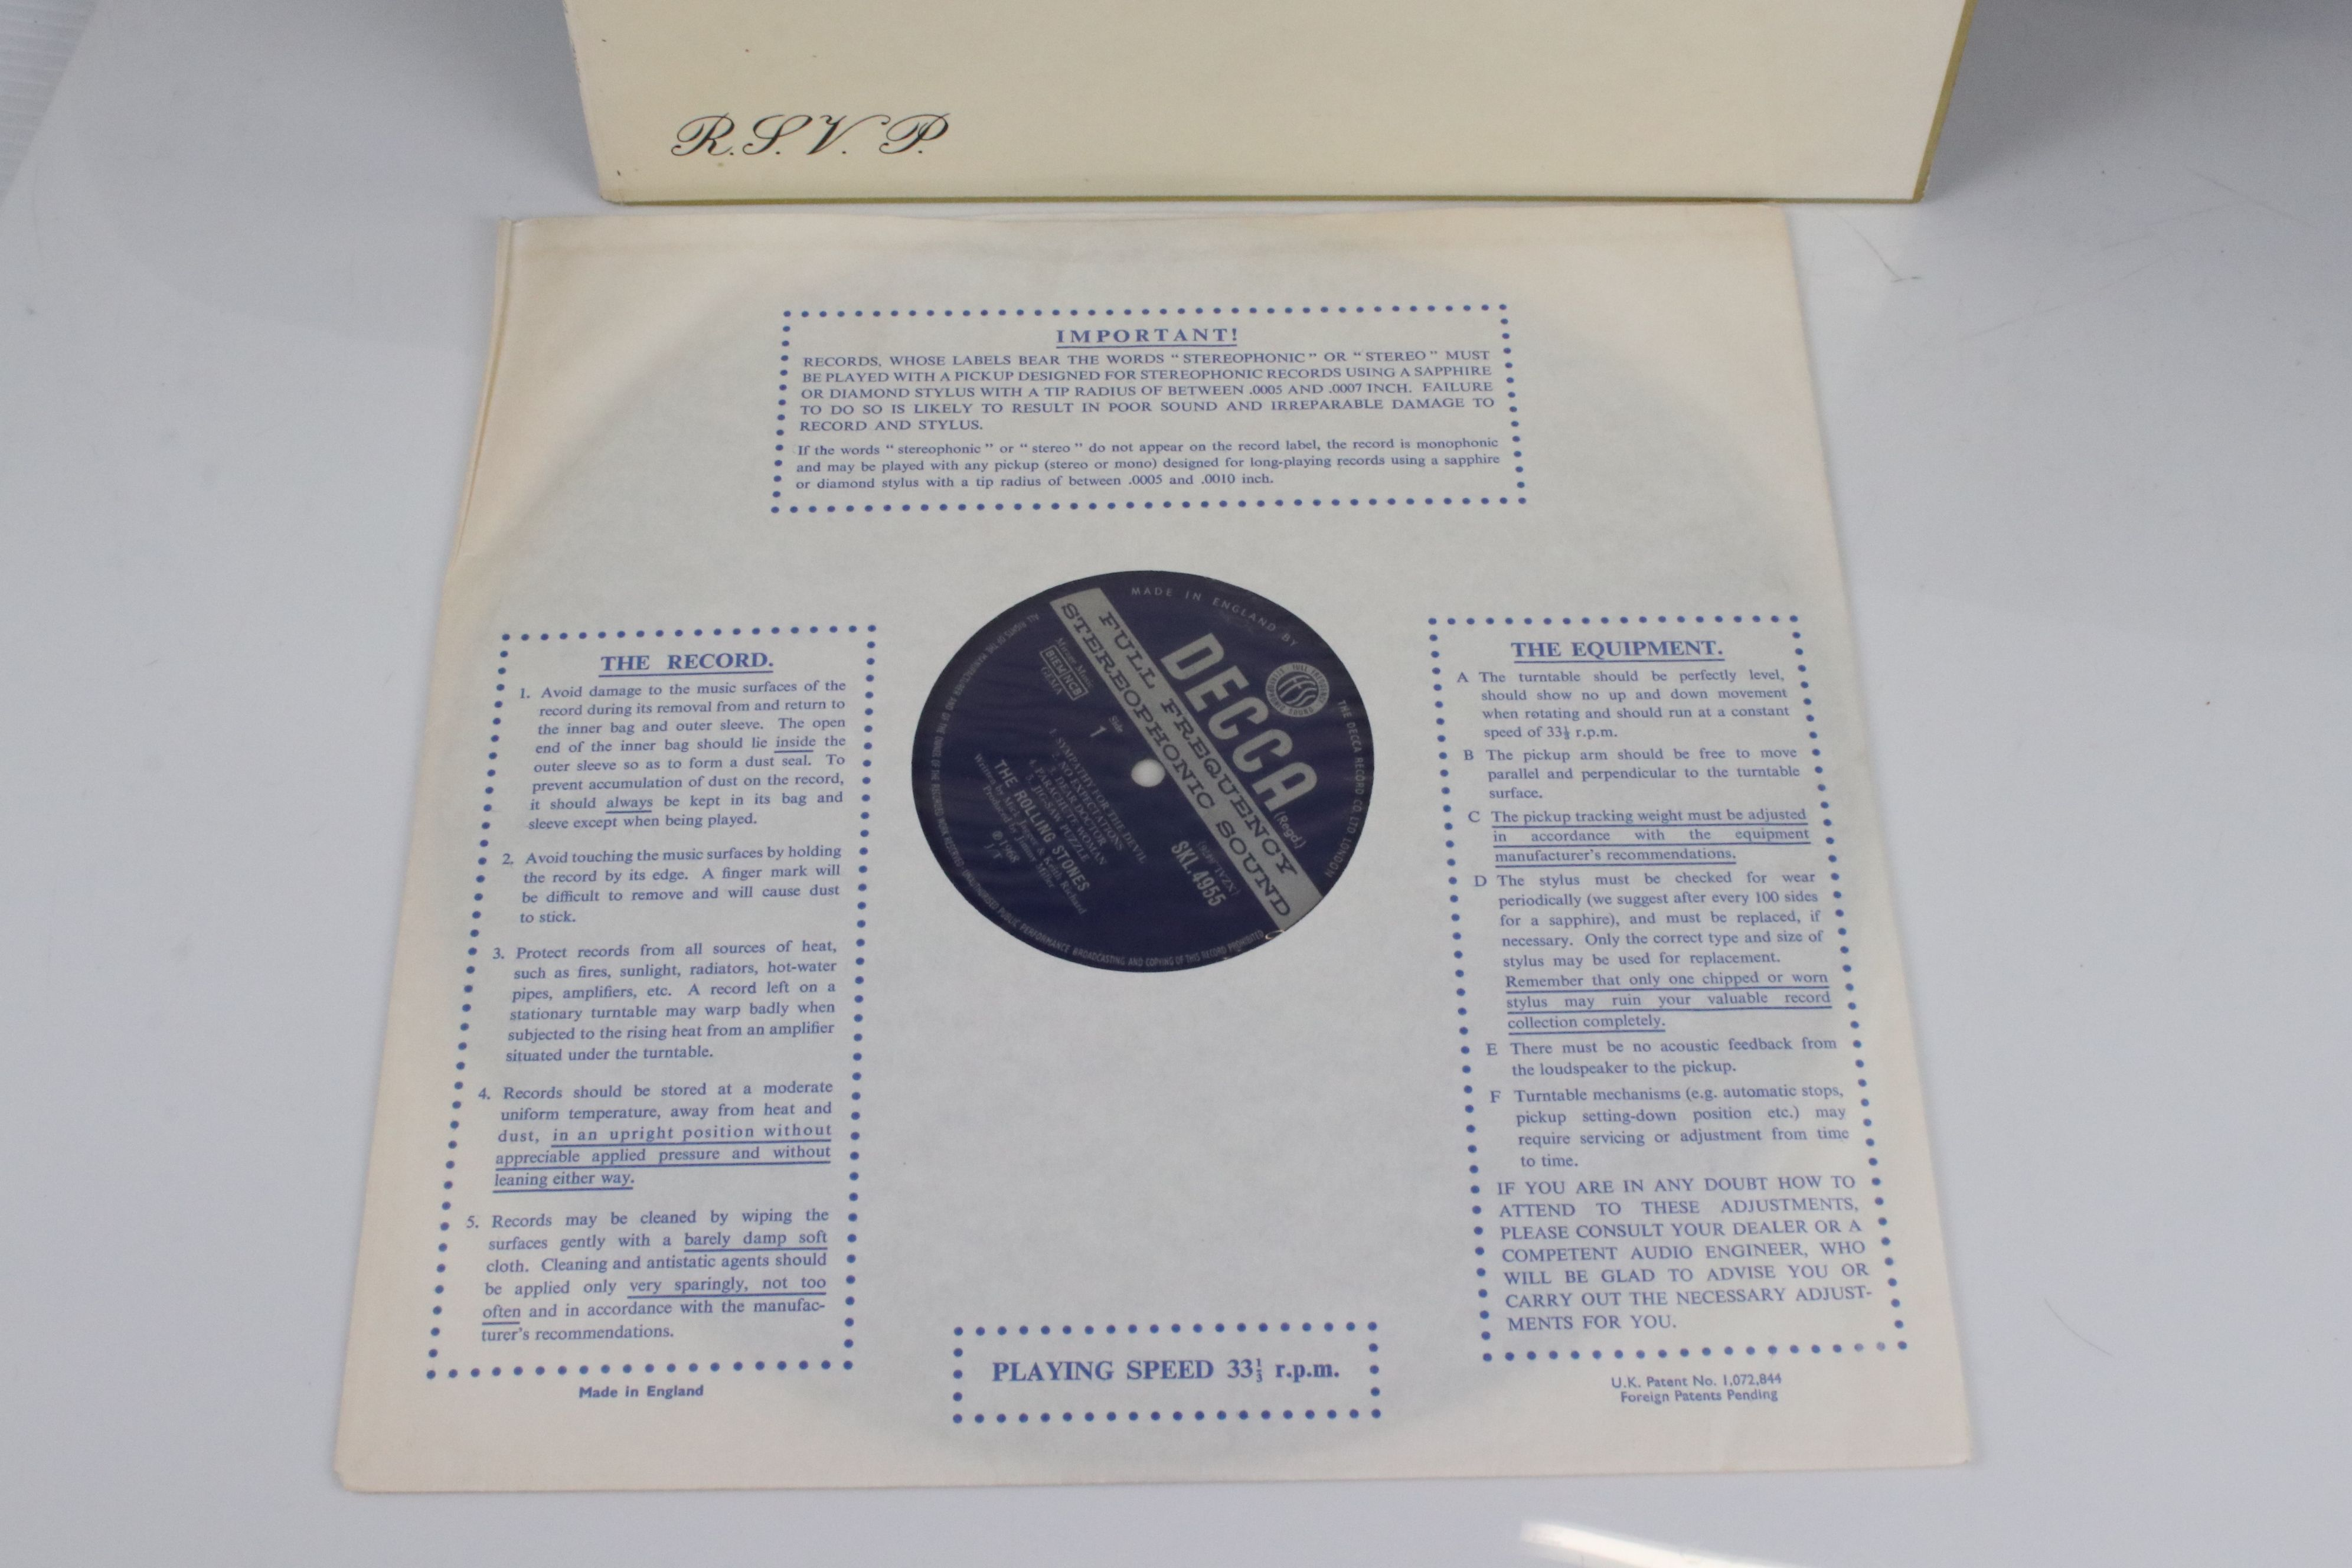 Vinyl - The Rolling Stones Beggars Banquet (SKL 4955) blue Decca label, Mirage Music, titles - Image 5 of 6